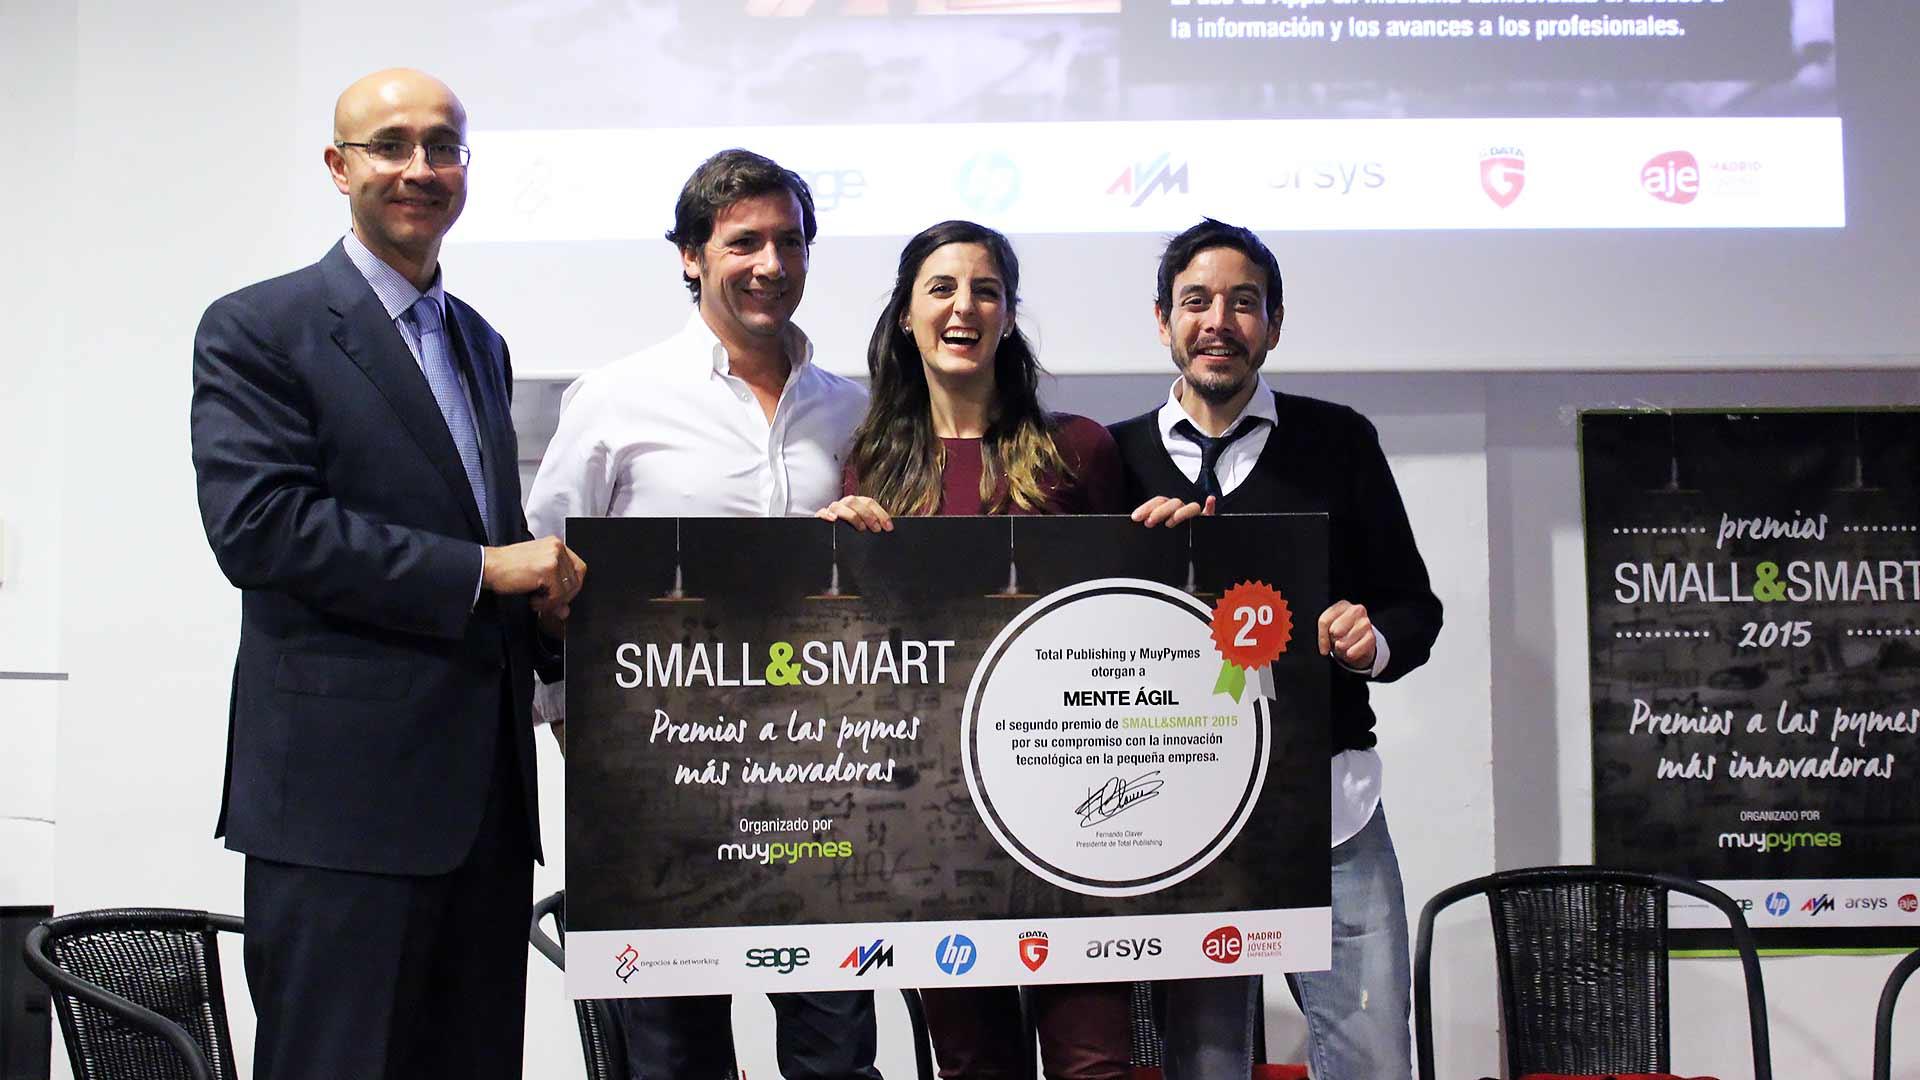 smallsmart-premios-startups-pymes-2015-ganador2-menteagil